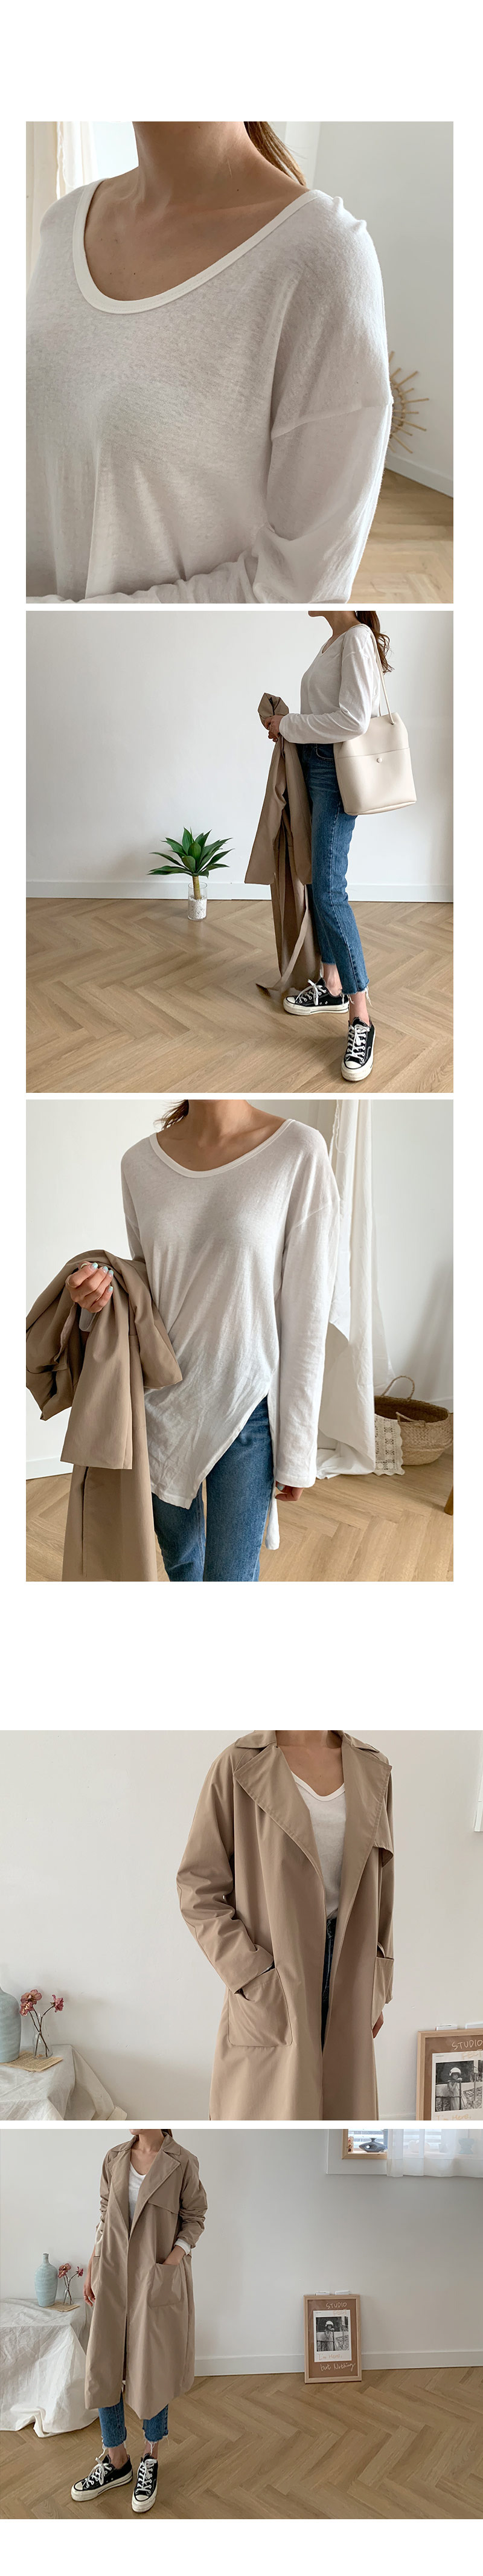 Here Fit U-neck Slit T-shirt